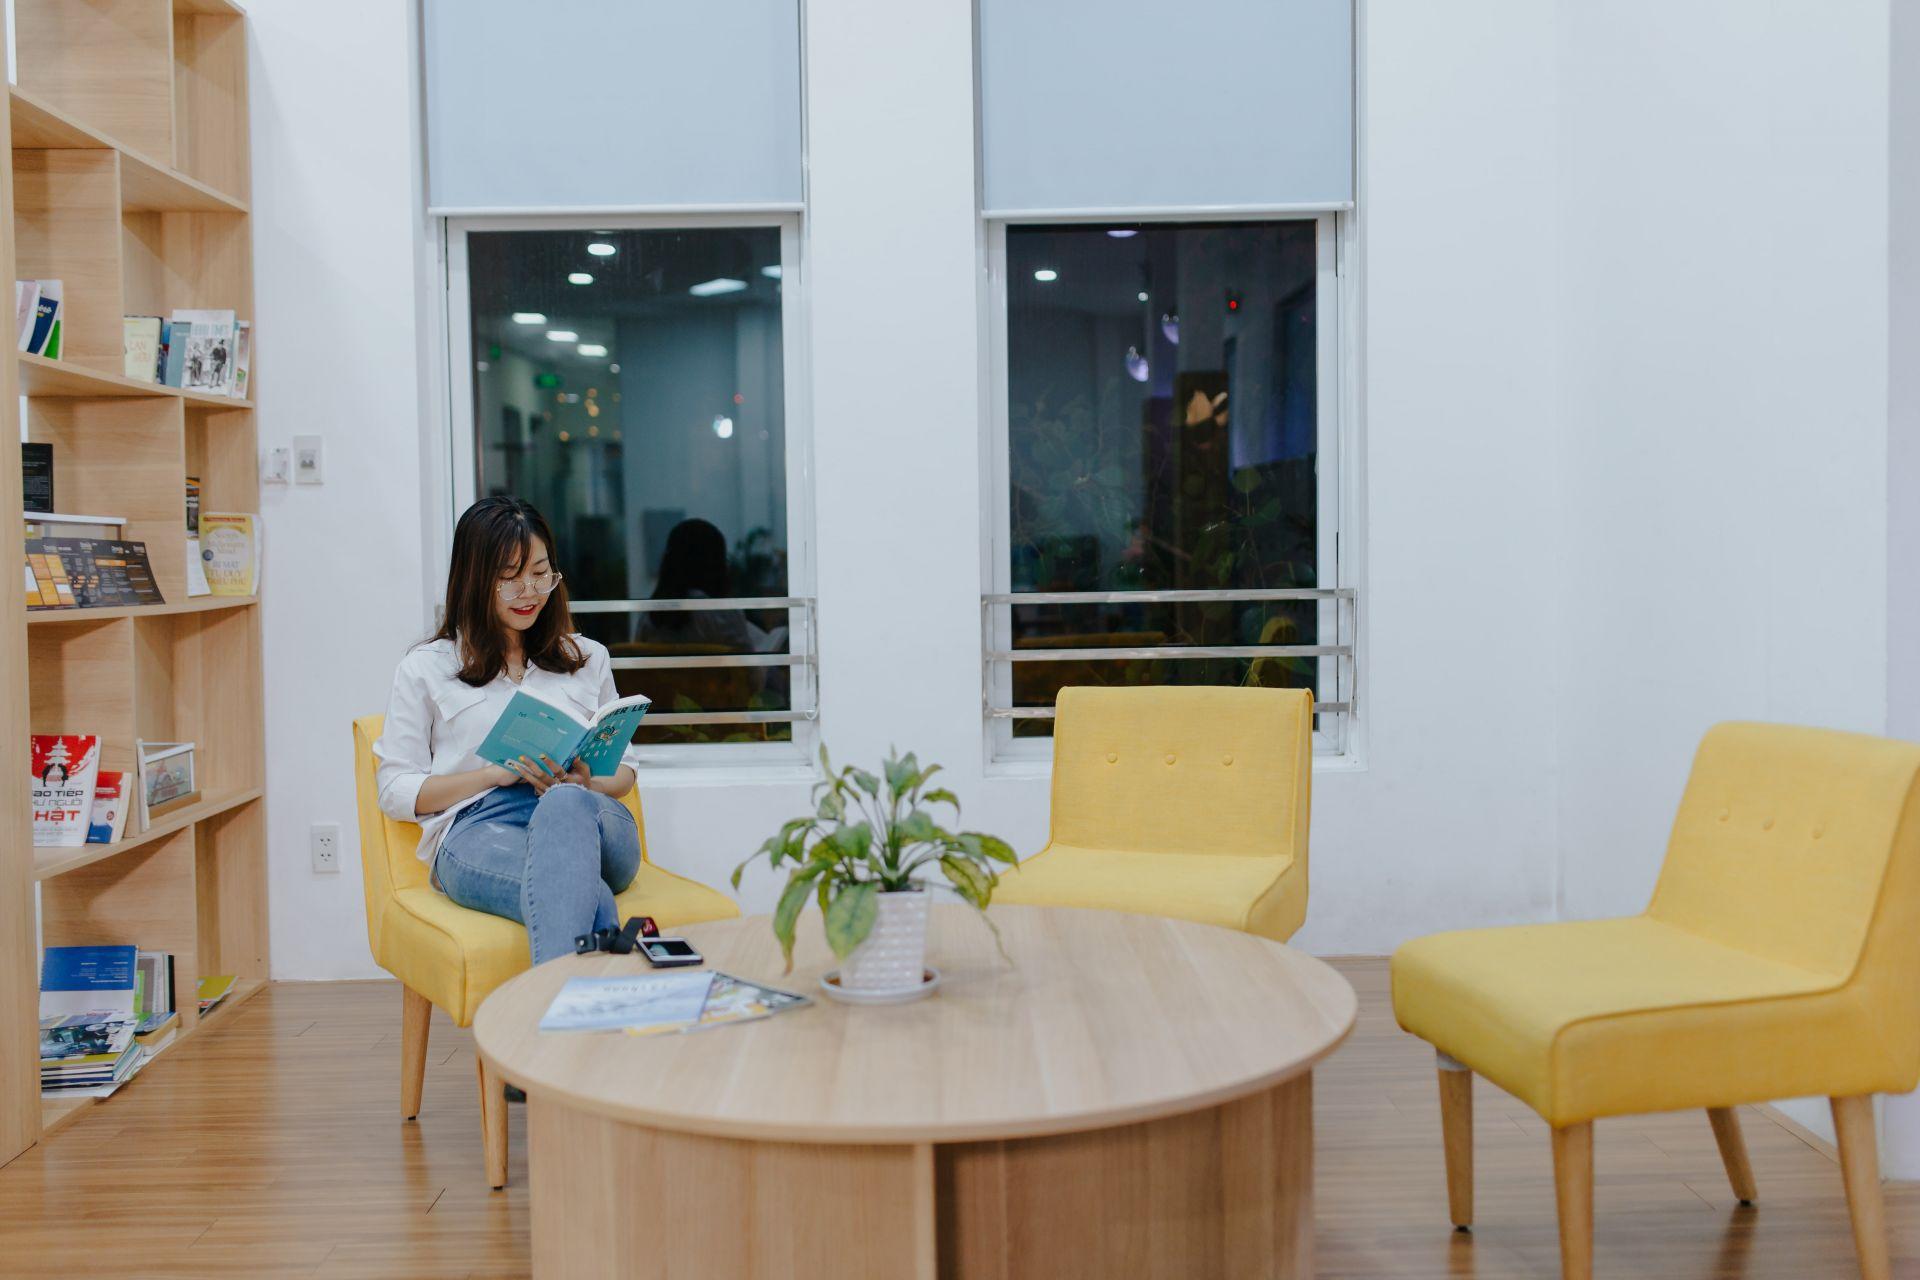 DNC - Danang Coworking Space, Da Nang - Book Online - Coworker